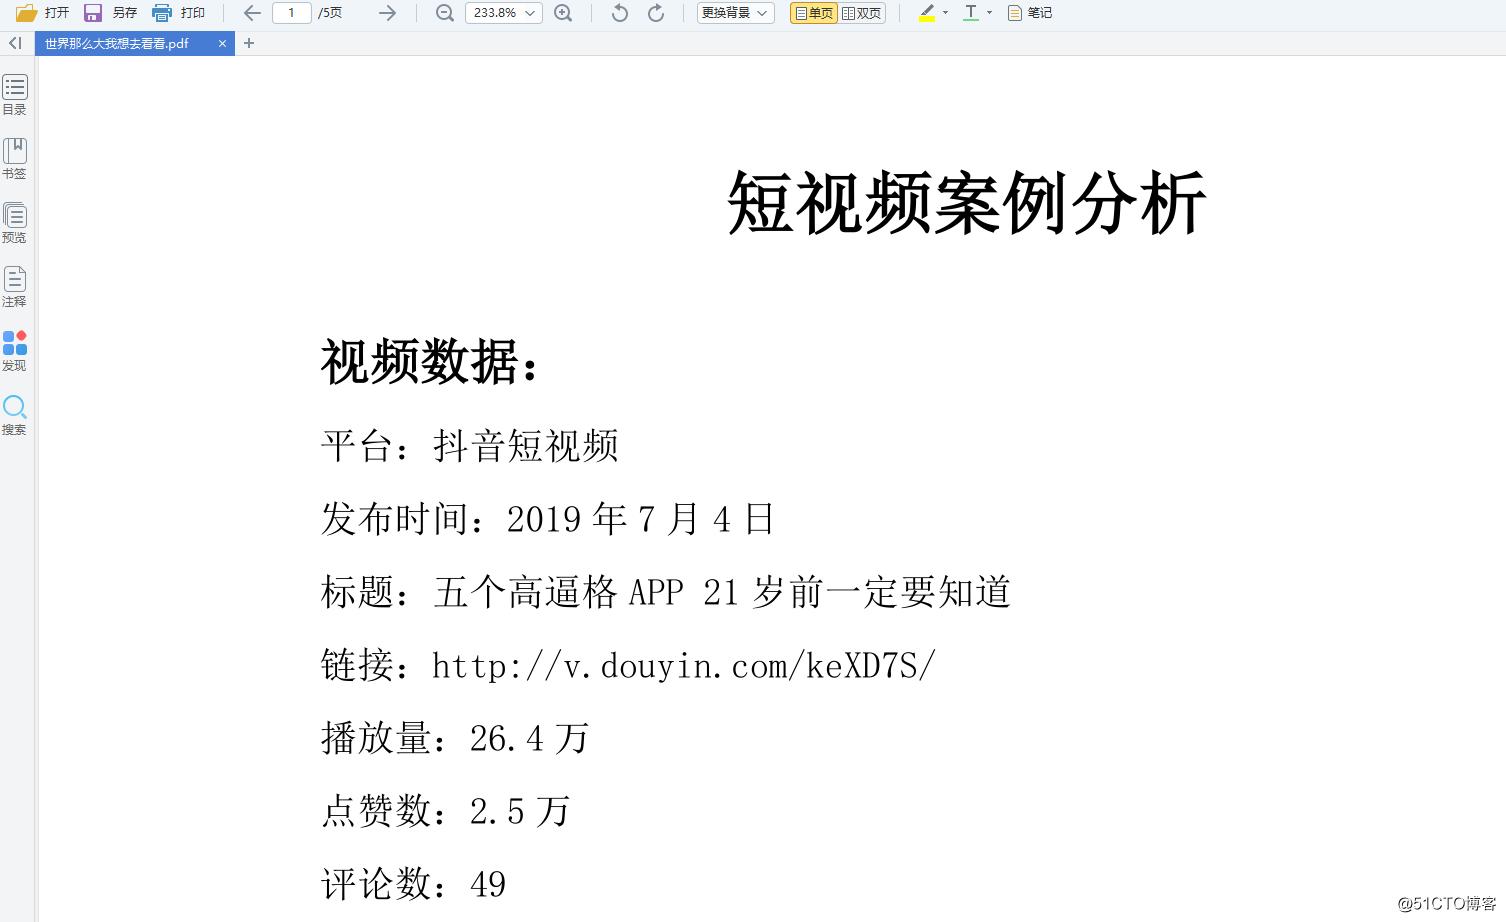 pdf如何压缩?俩种操作让你菜鸟变大神